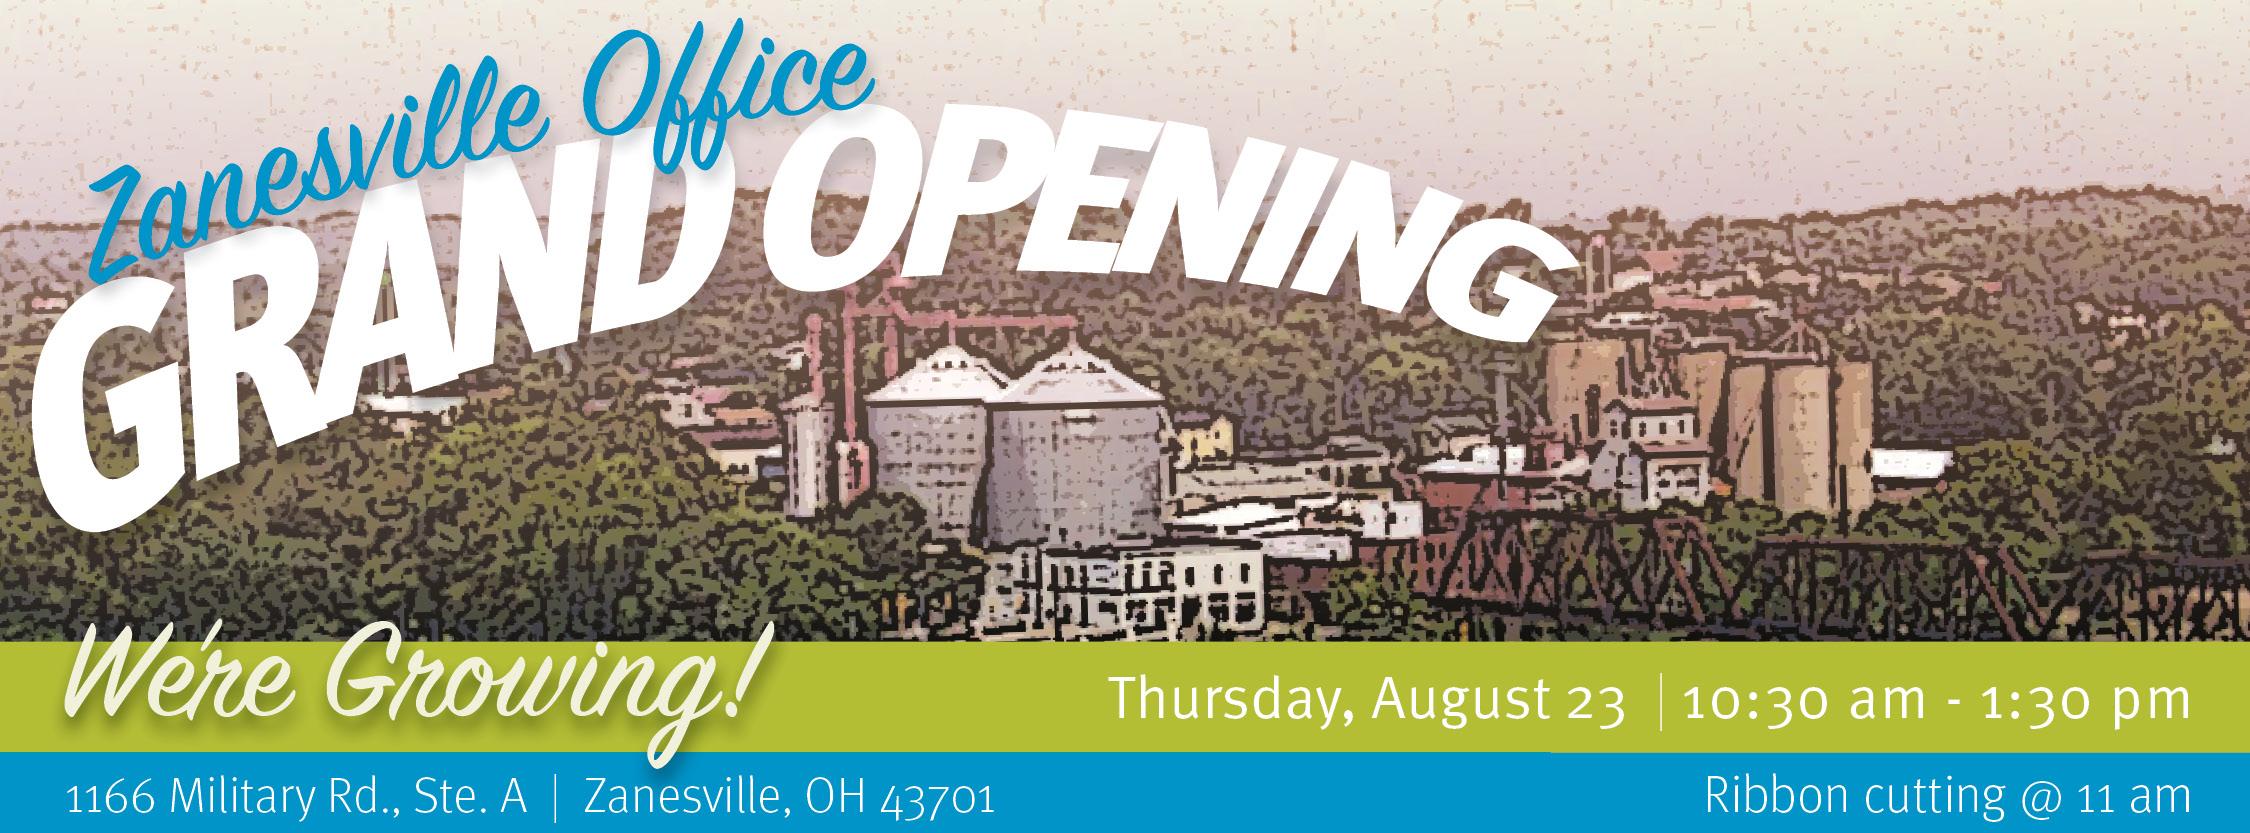 Zanesville Office Grand Opening!